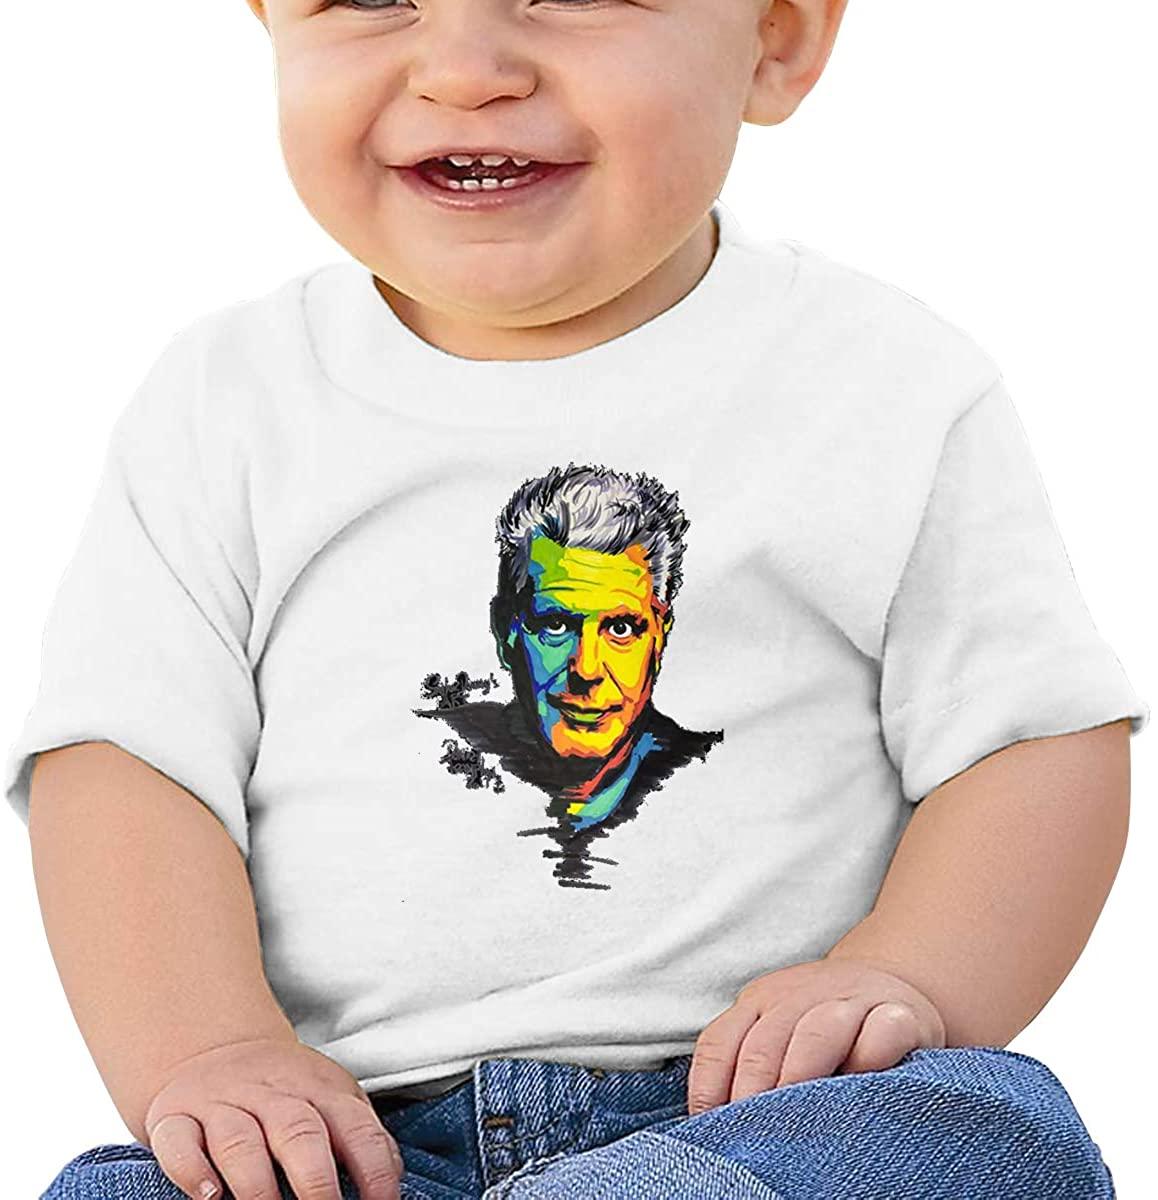 6-24 Months Boy and Girl Baby Short Sleeve T-Shirt Anthony Bourdain Original Minimalist Style White